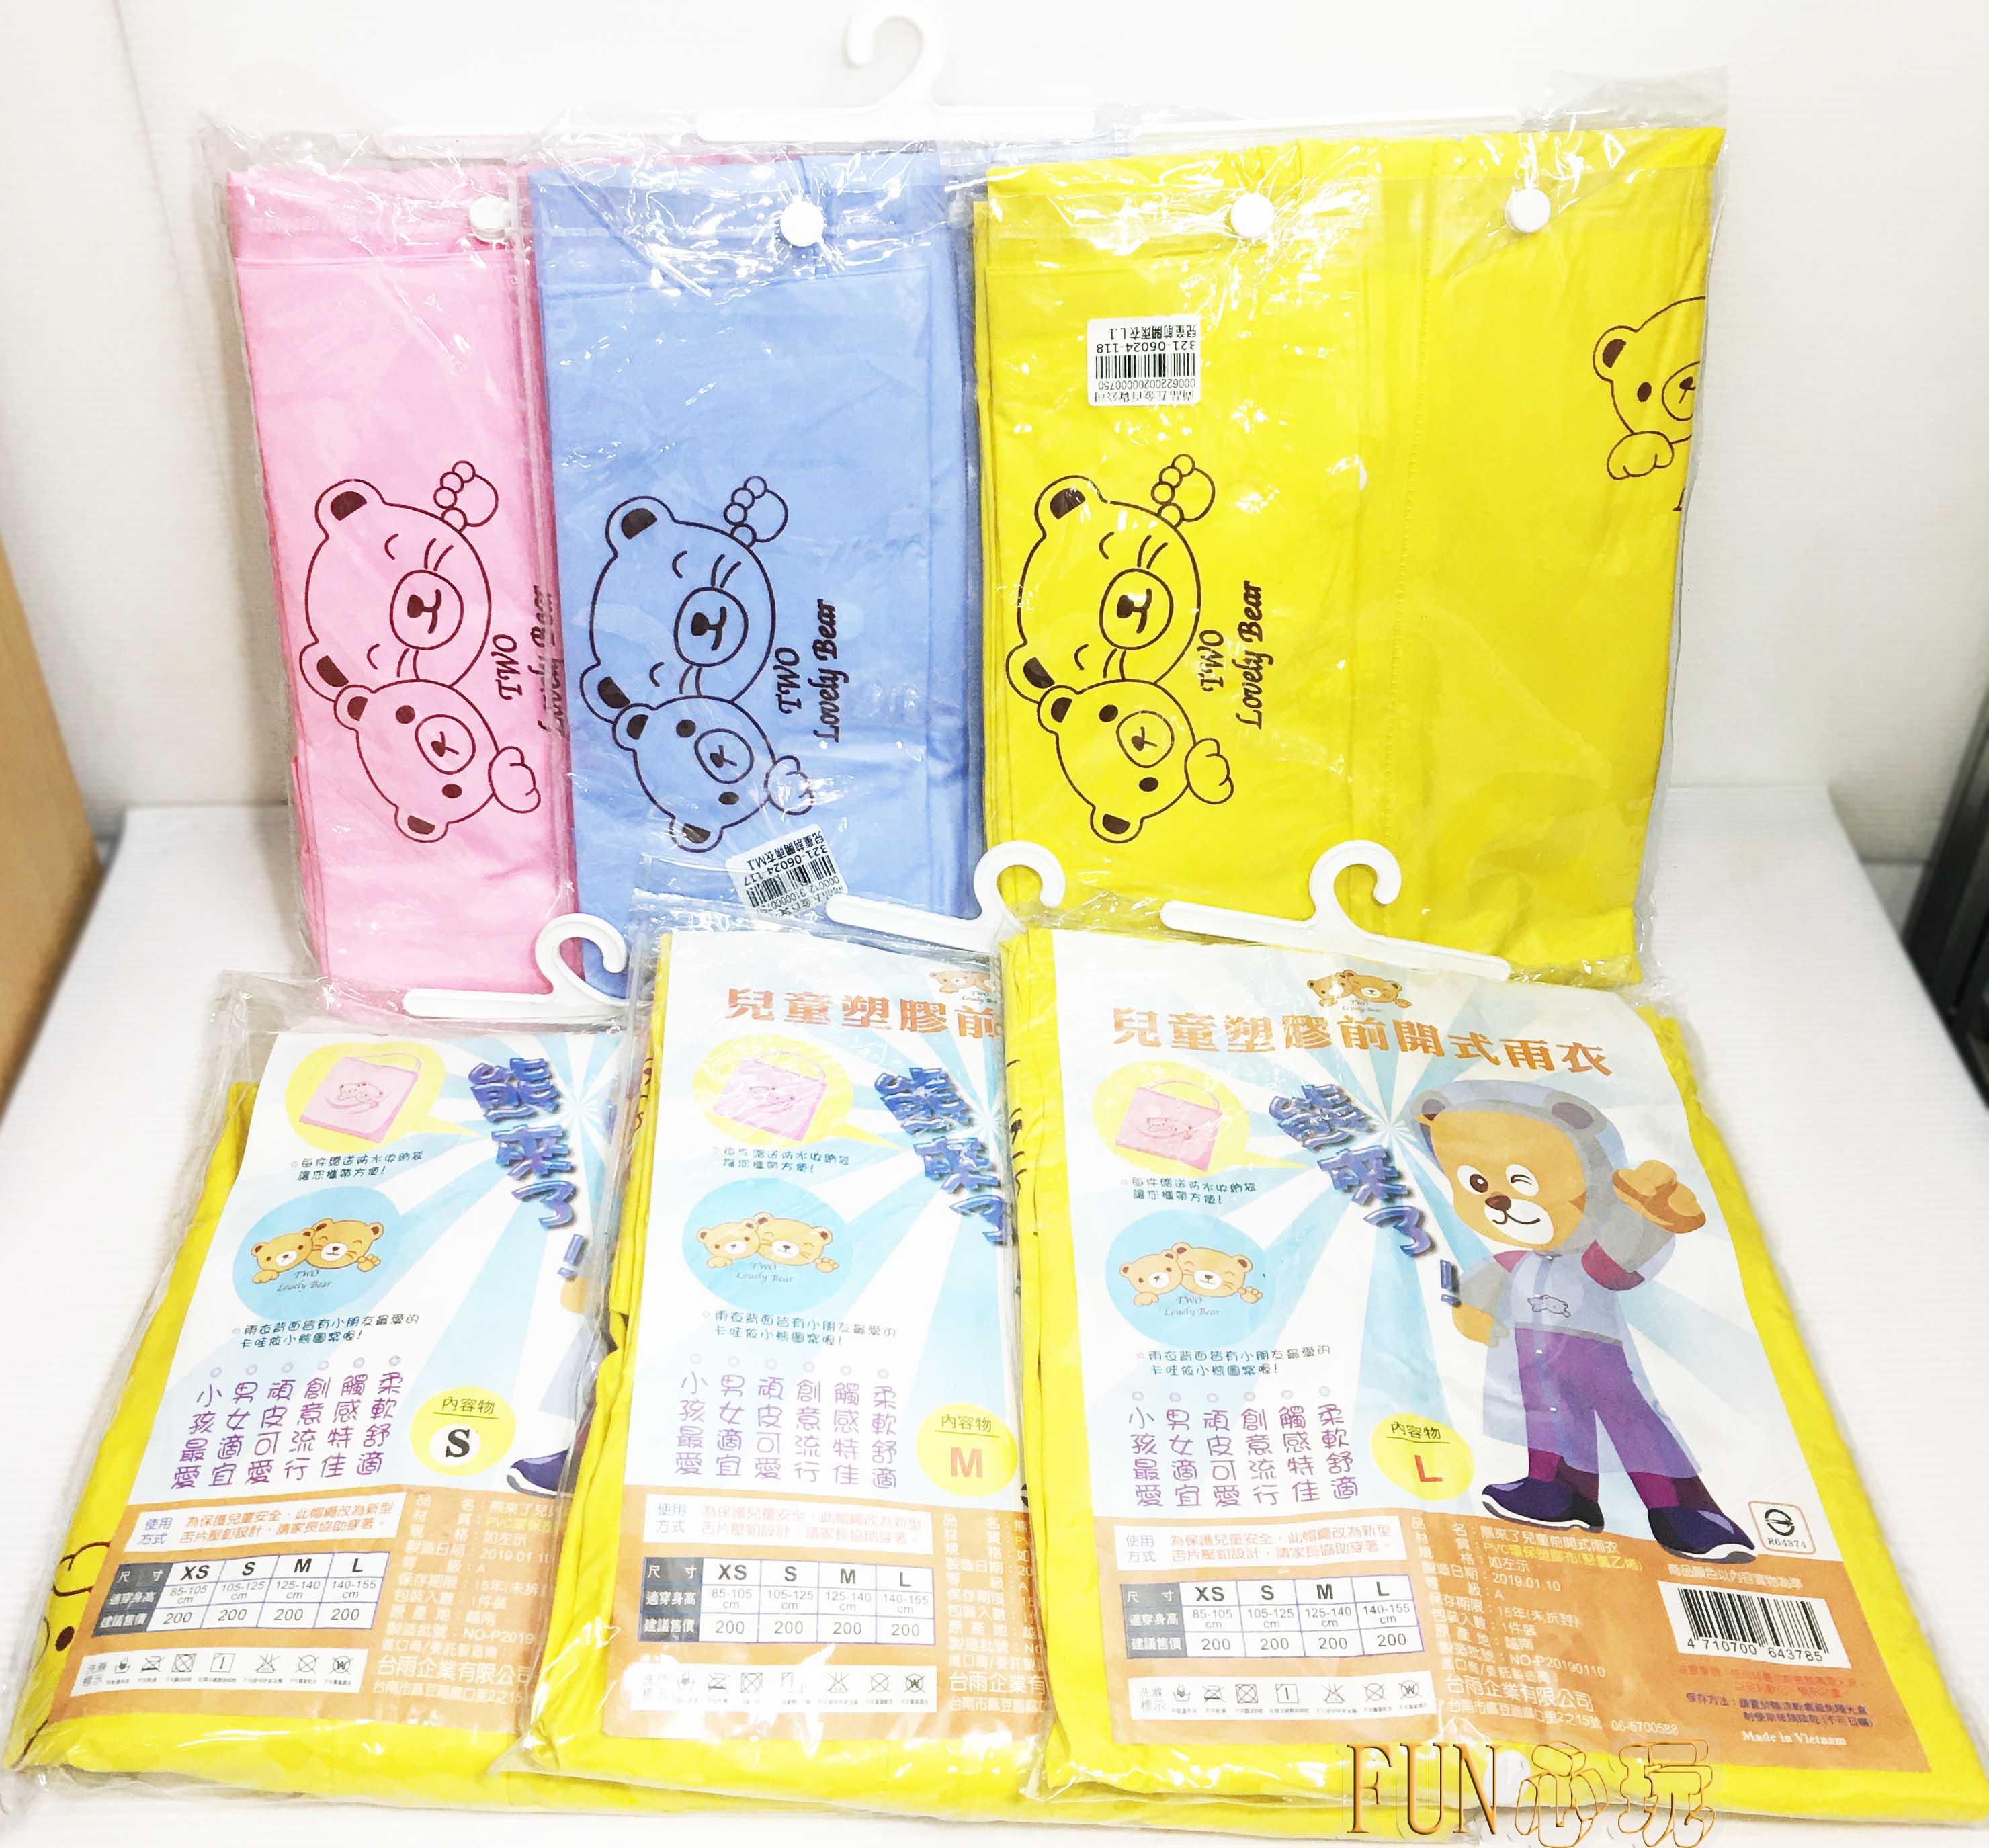 【Fun心玩】熊來了 小熊 兒童前開式雨衣 前開雨衣 兒童 雨衣 雨具 生活用品 S號 / M號 / L號